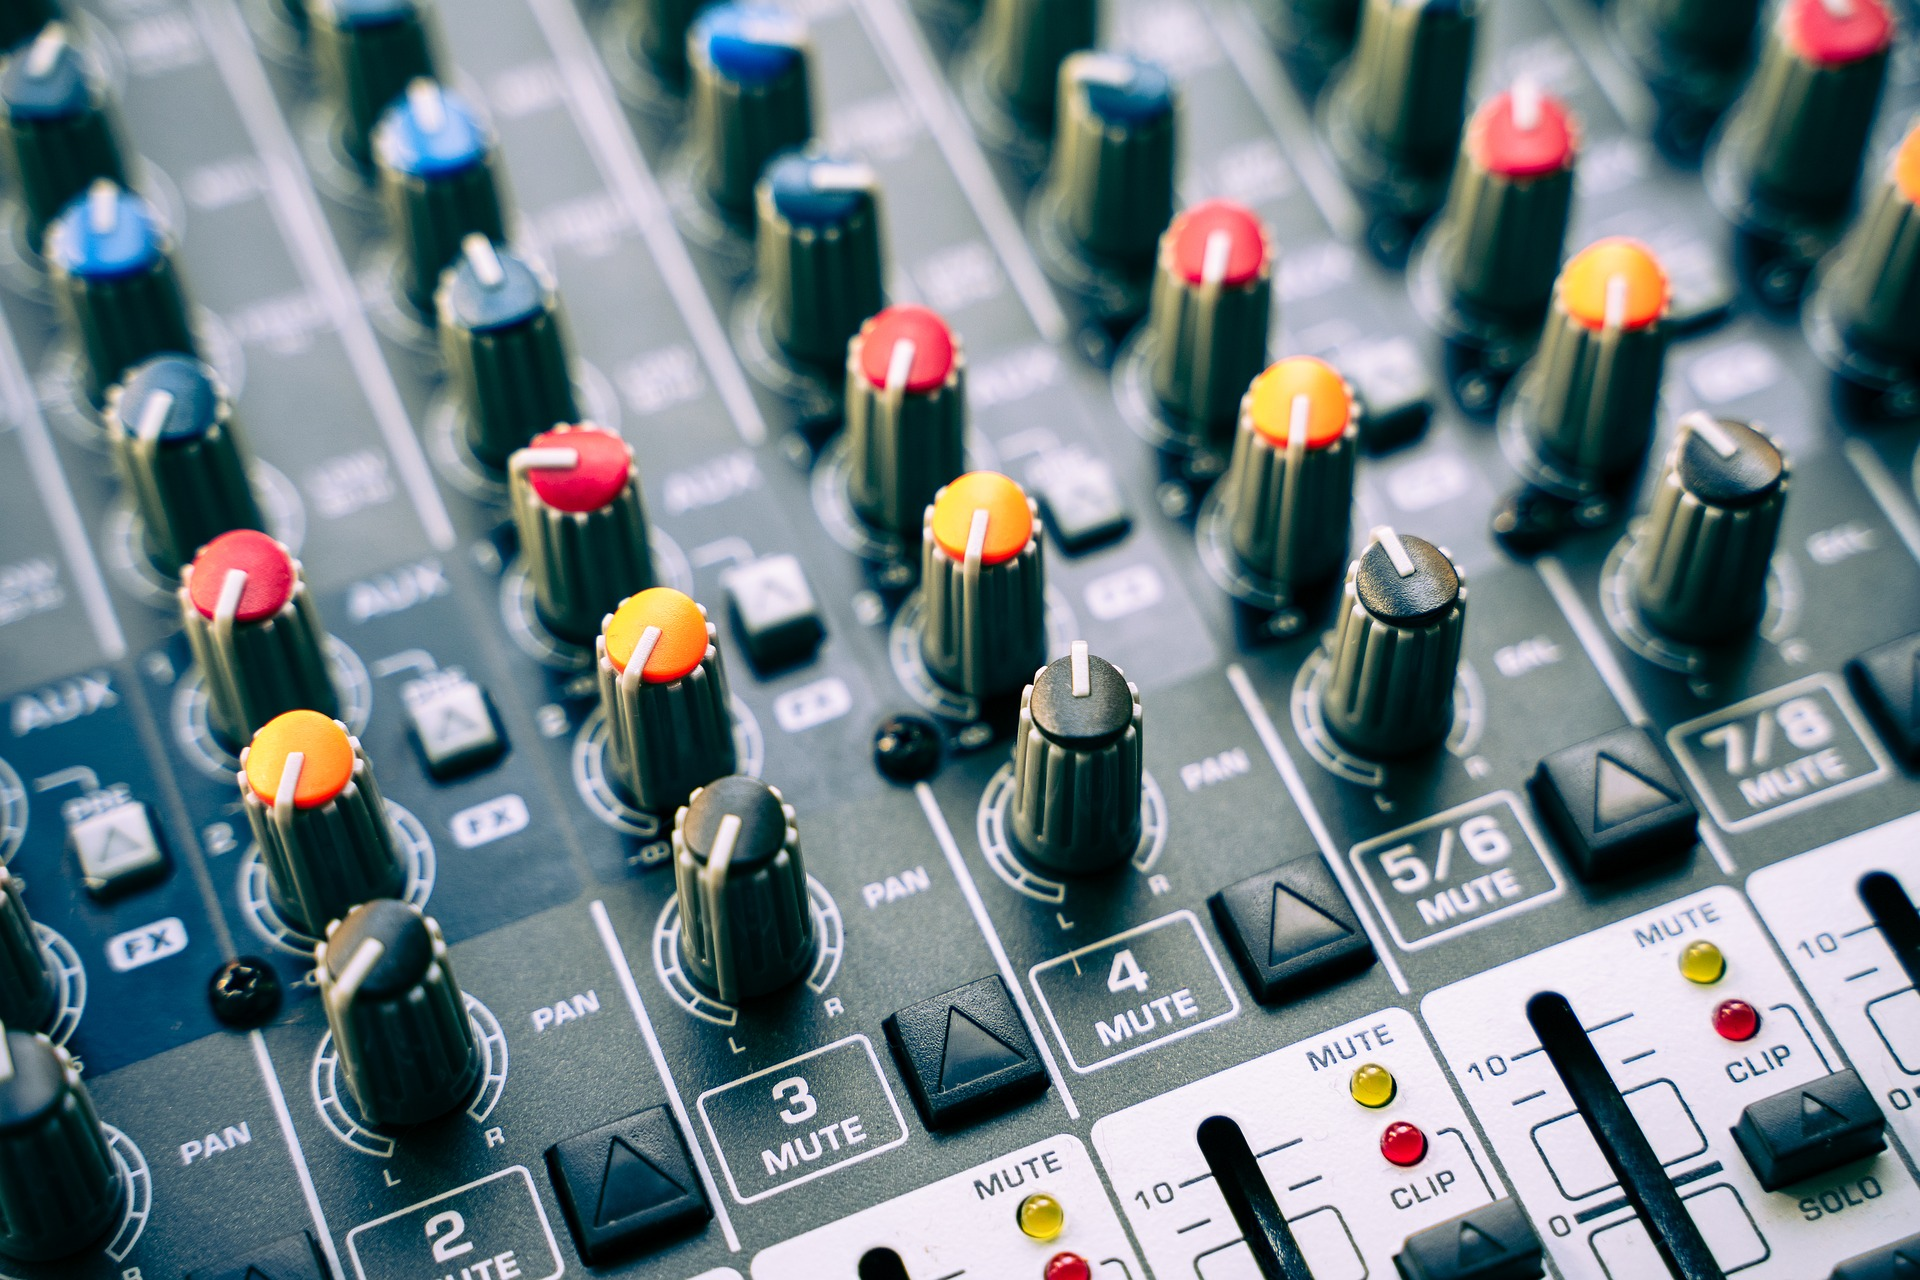 mixer-4197733_1920.jpg